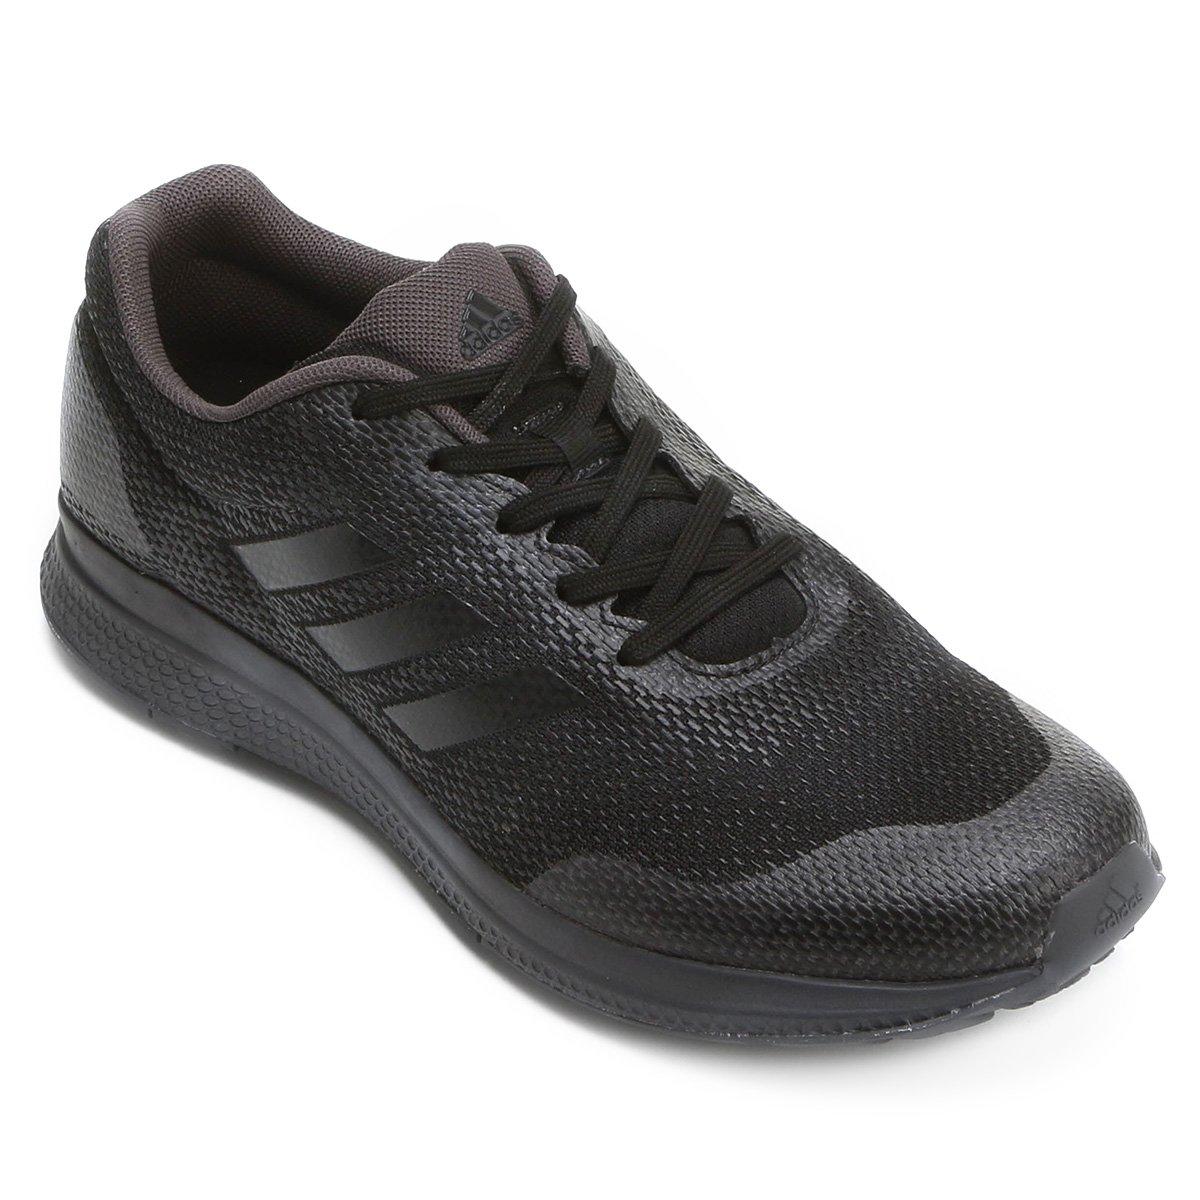 e6aaa76af1b Tênis Adidas Mana Bounce 2 Masculino - Compre Agora